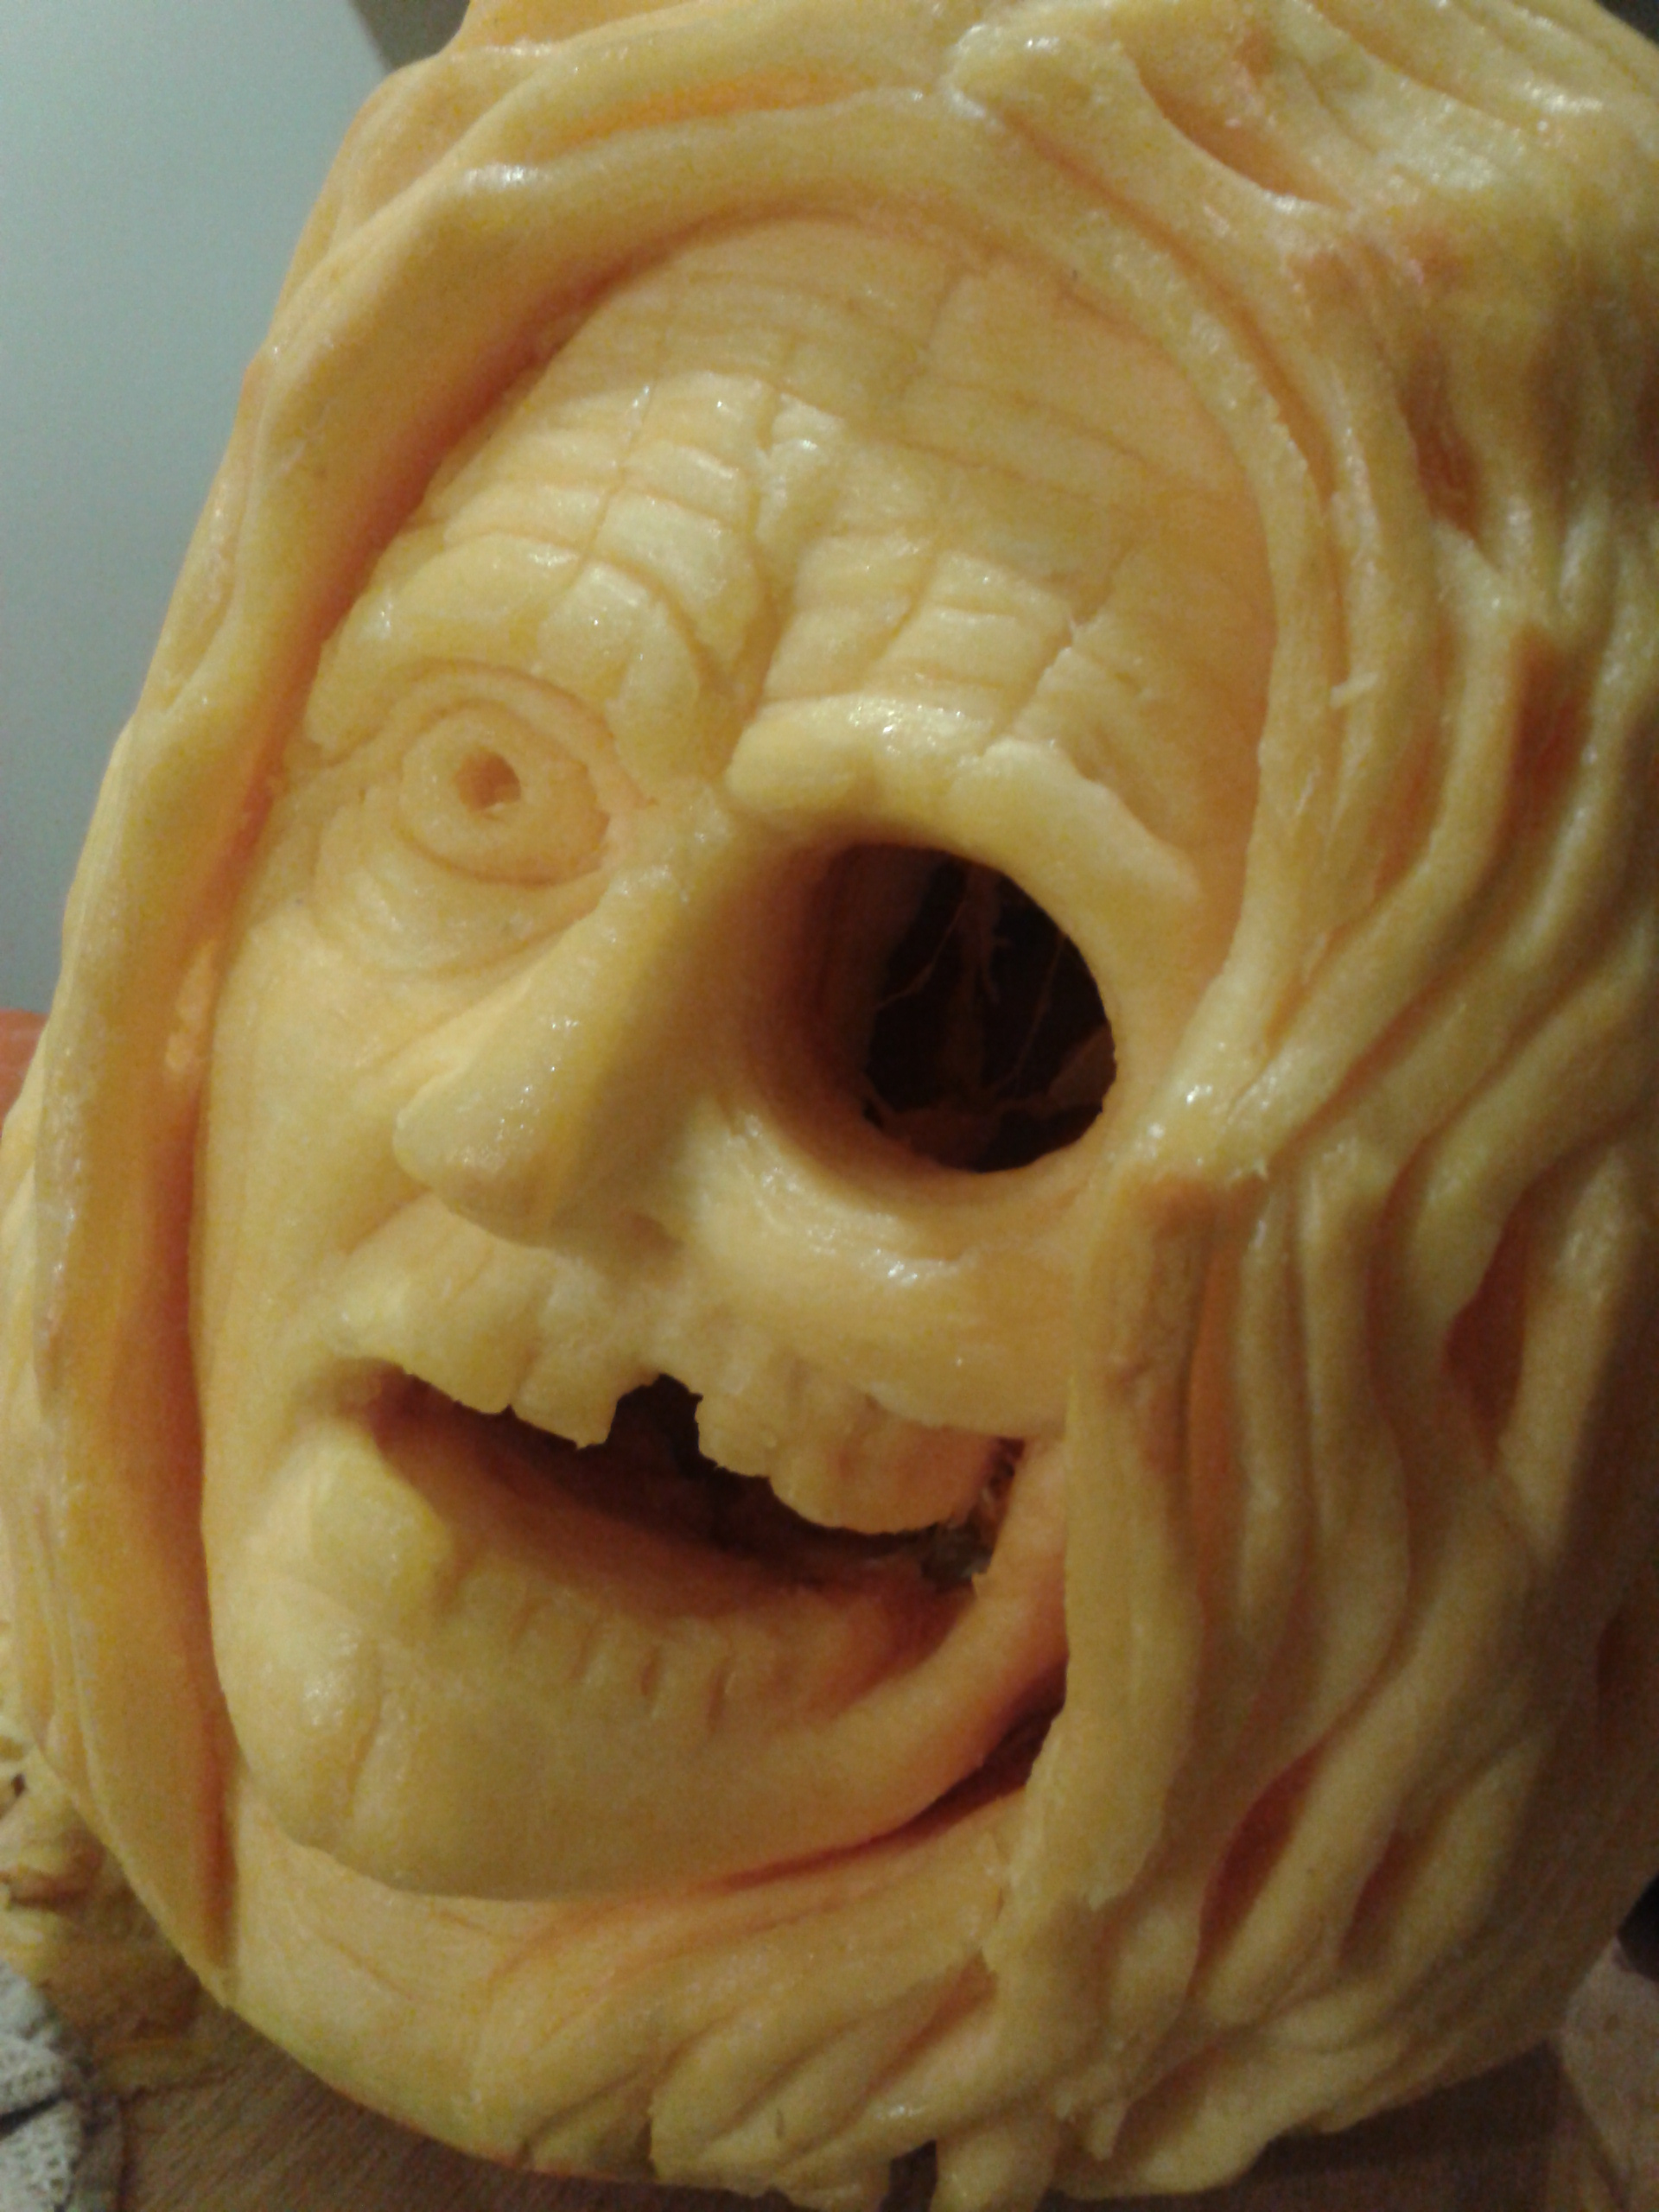 Witch pumpkin by randomsculptor